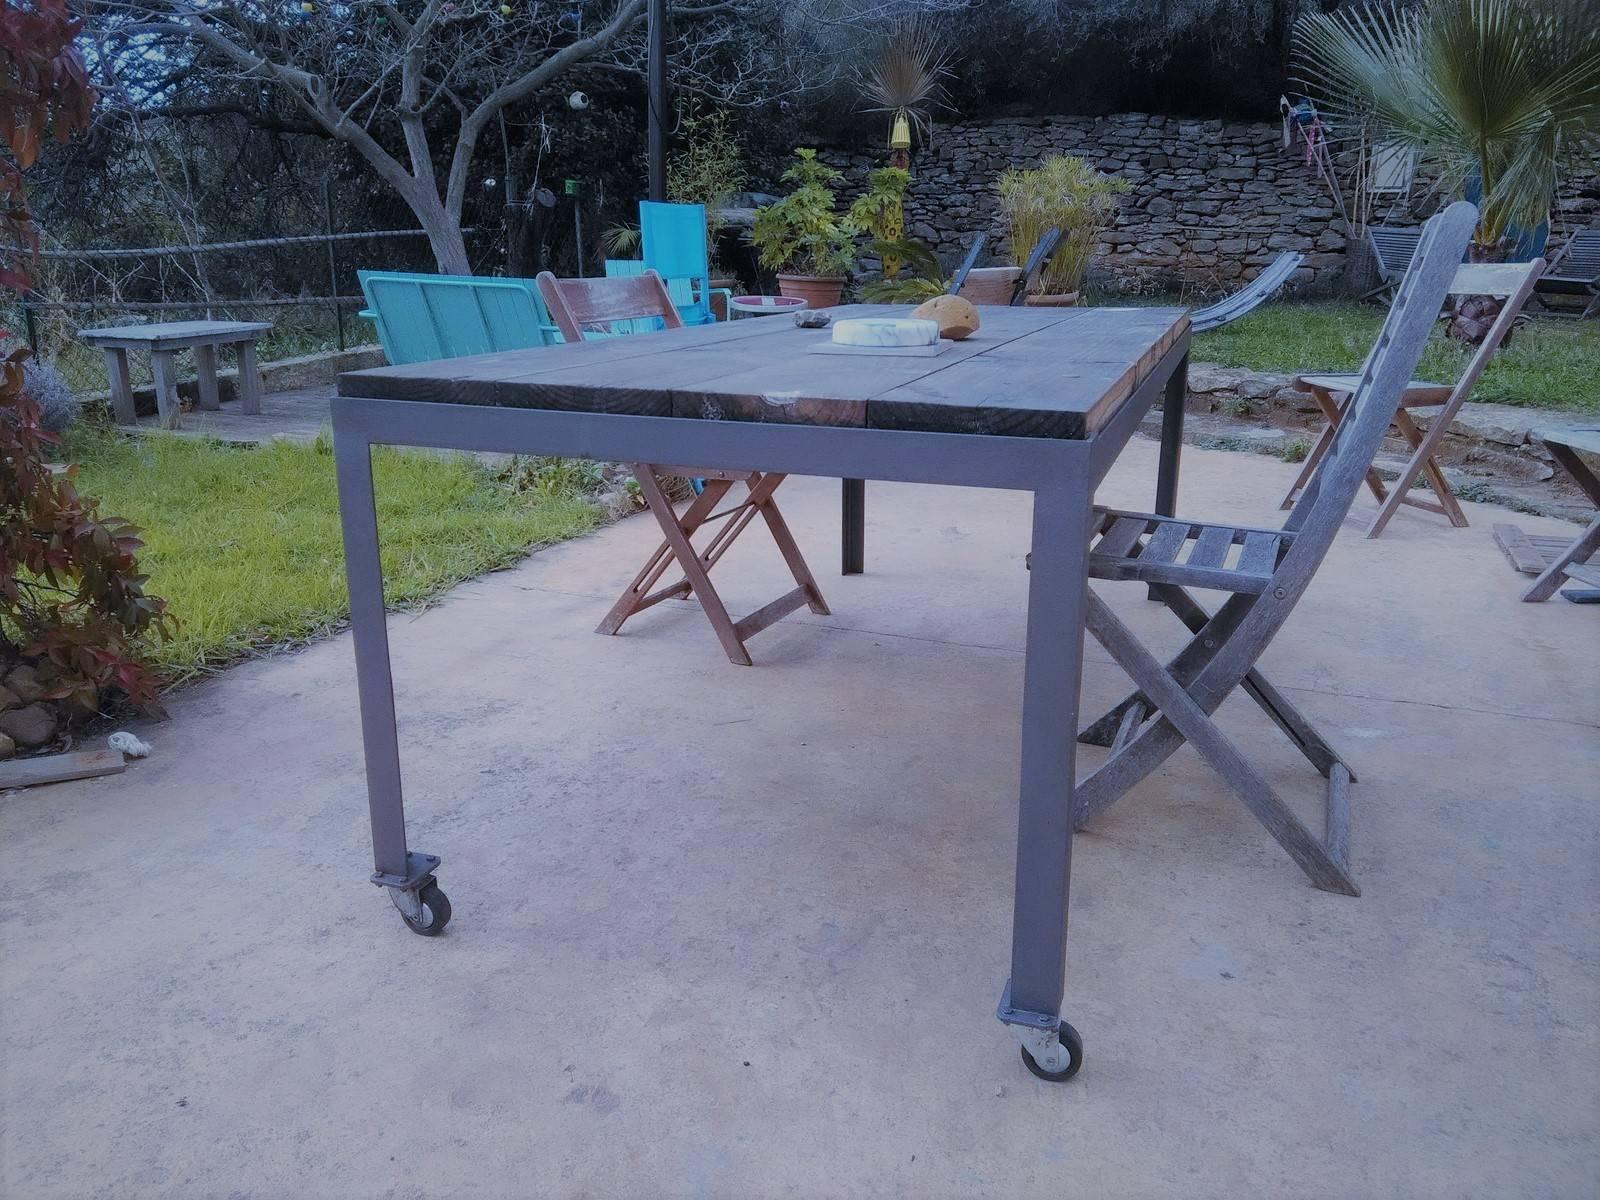 Table de jardin sur mesure en acier la ciotat 13 for Table exterieur sur mesure